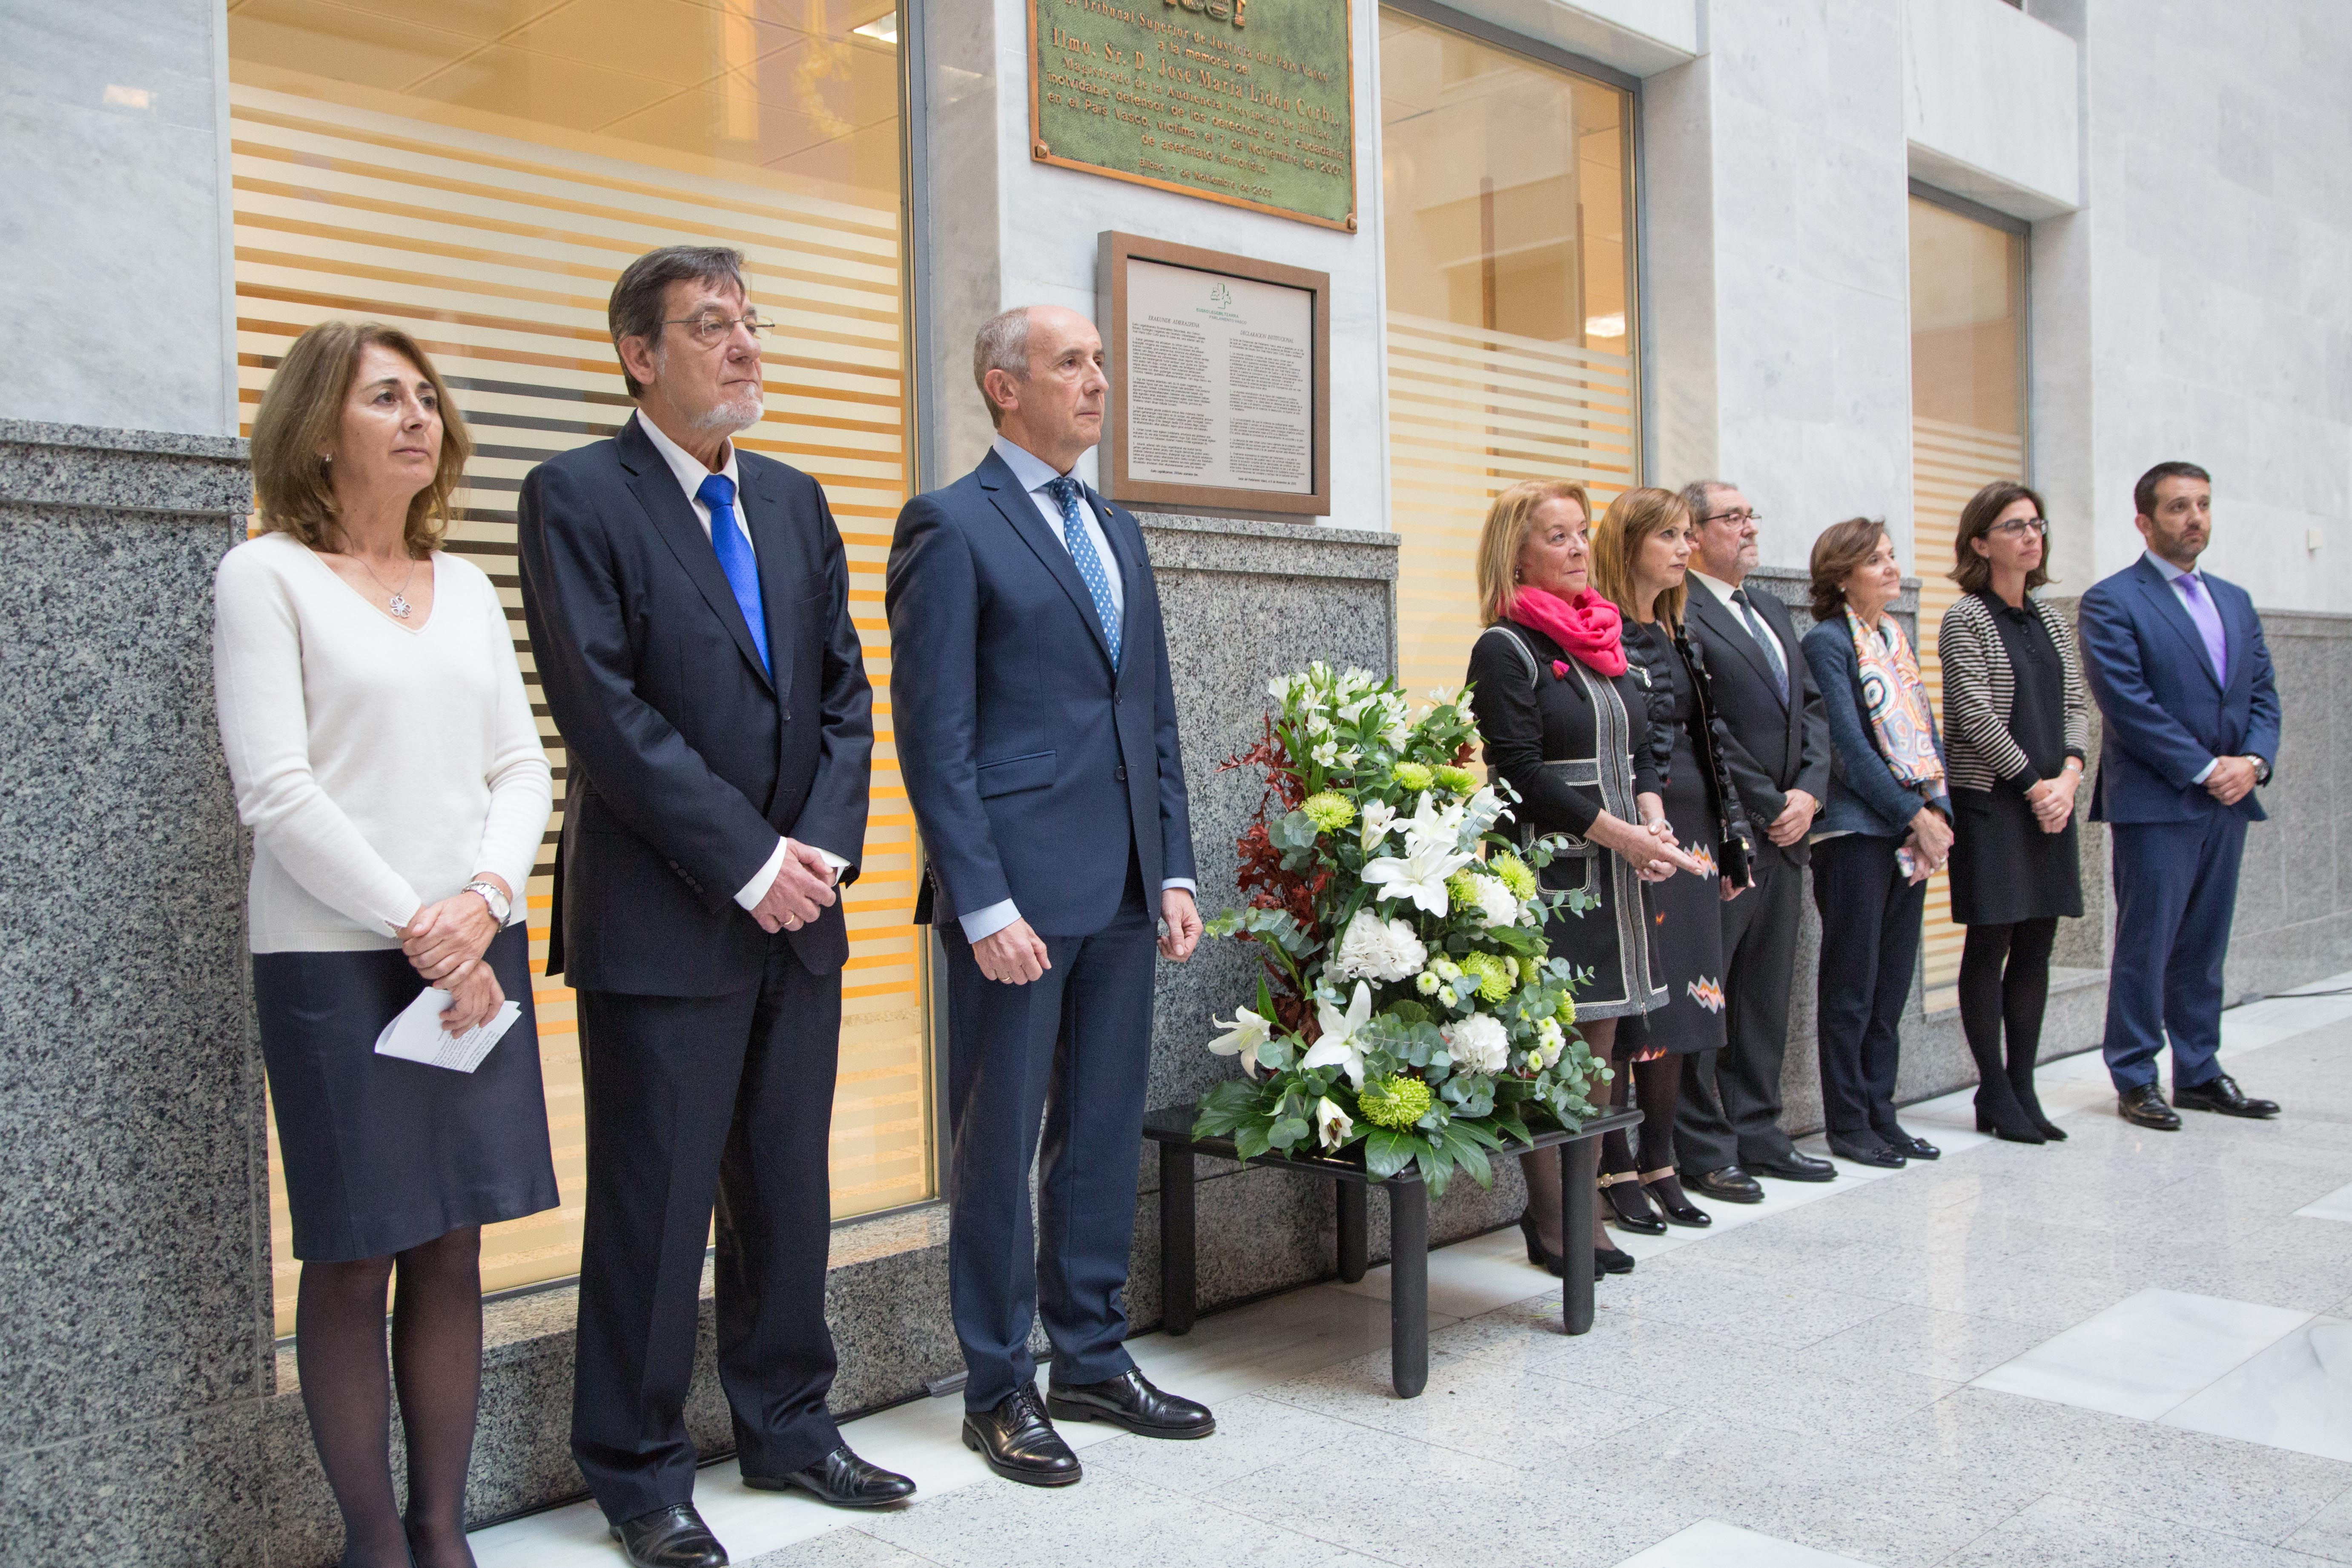 Josu Erkoreka eta María Jesús San José, José María Lidóni egindako omenaldian izan dira